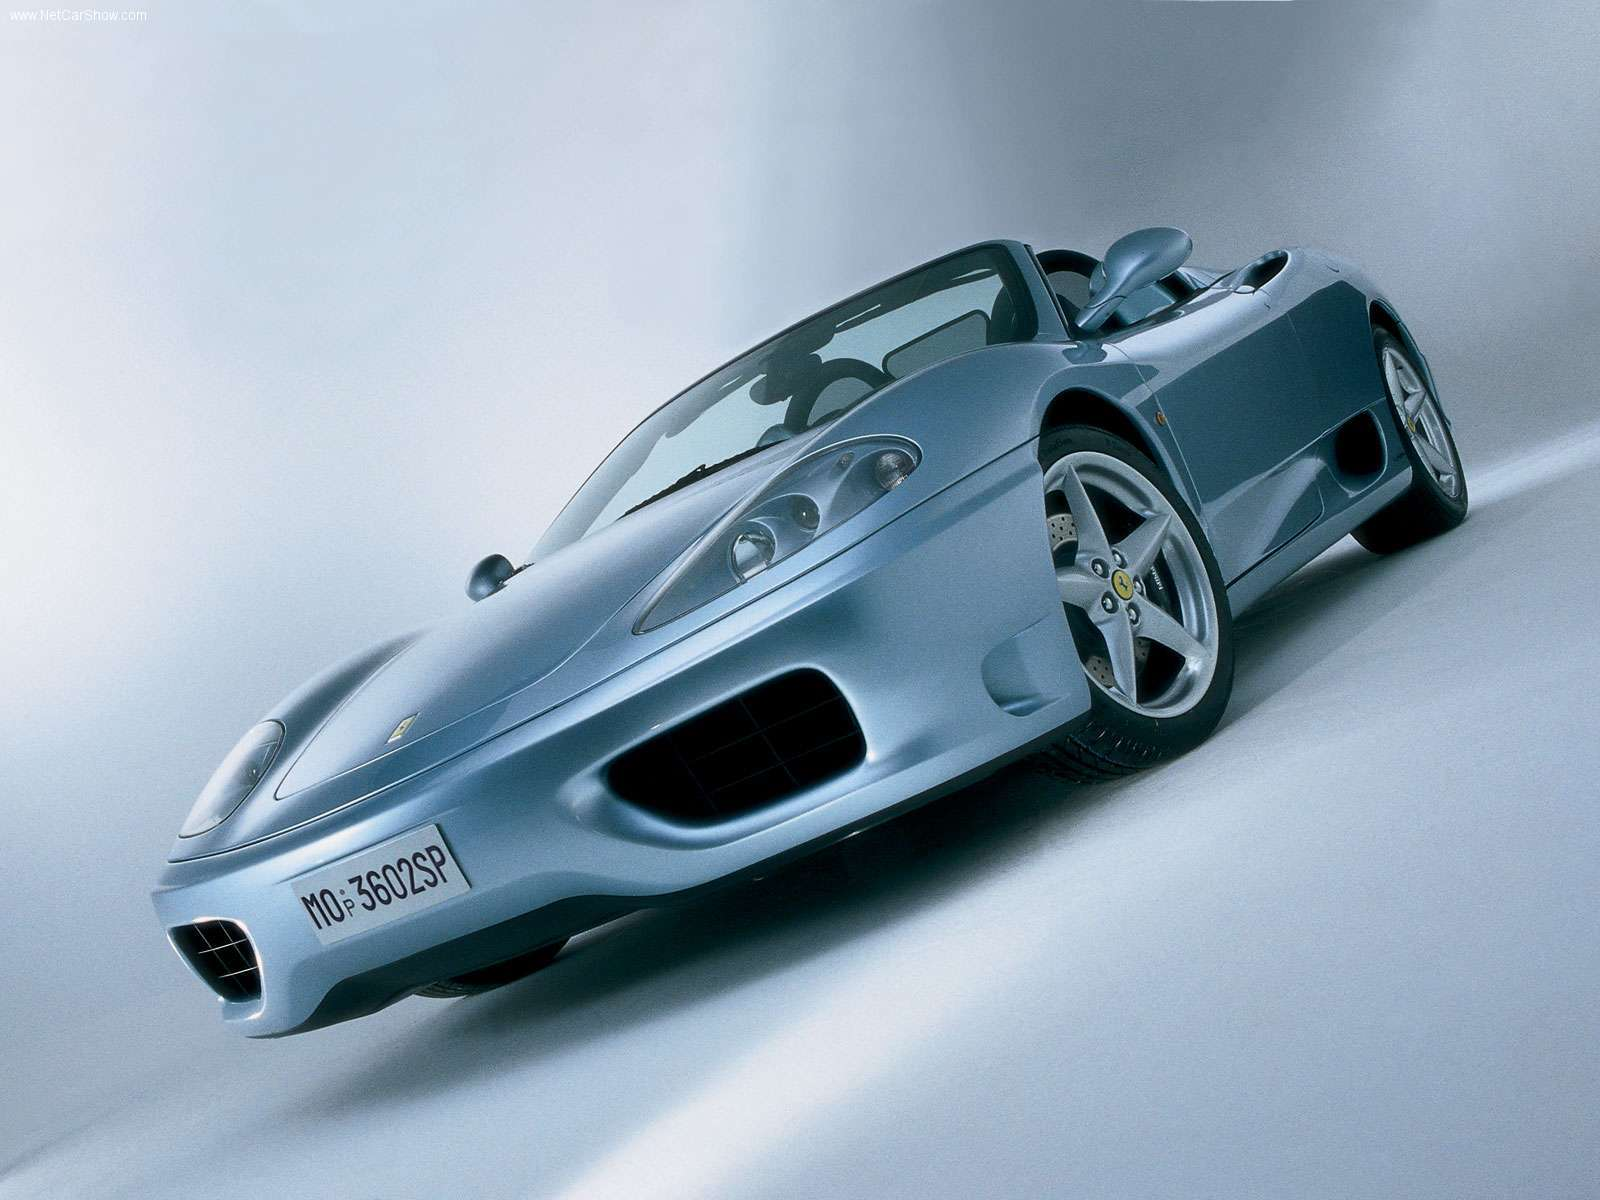 http://1.bp.blogspot.com/-1y2OlZtNqa8/Tr4GkPyEDXI/AAAAAAAAAOk/TD3G2vK57VA/s1600/Ferrari-360_Spider_2001_1600x1200_wallpaper_01.jpg